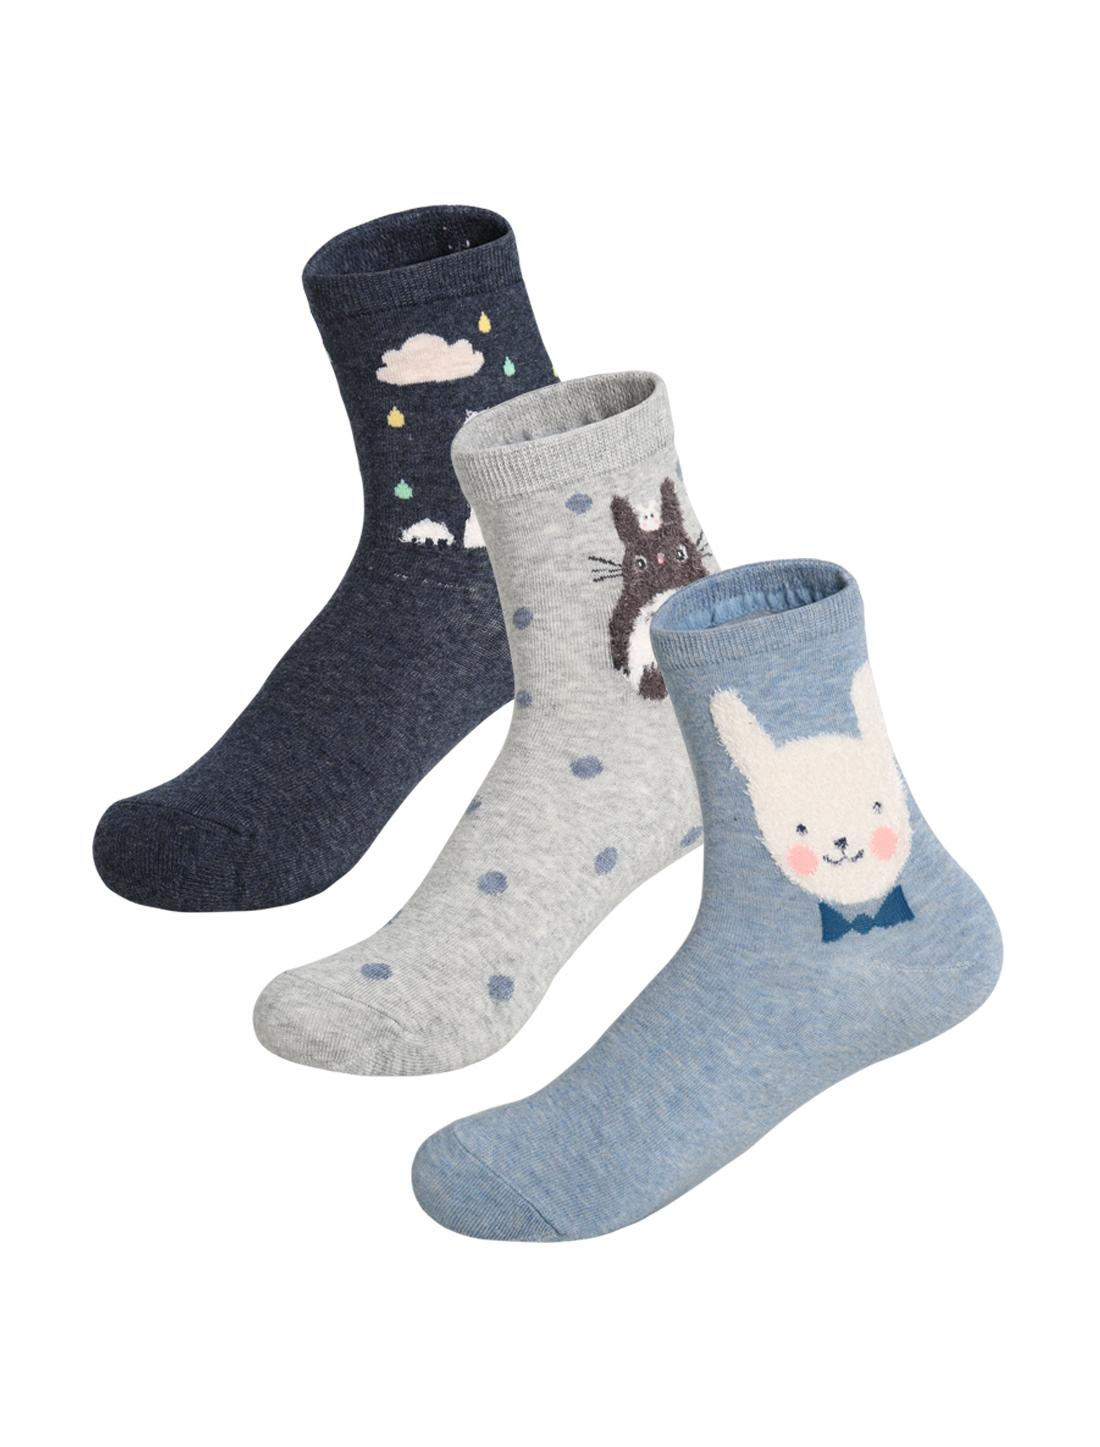 Women 3 pair Animal Novelty Pattern Crew Socks 9-11 Assorted-Novelty